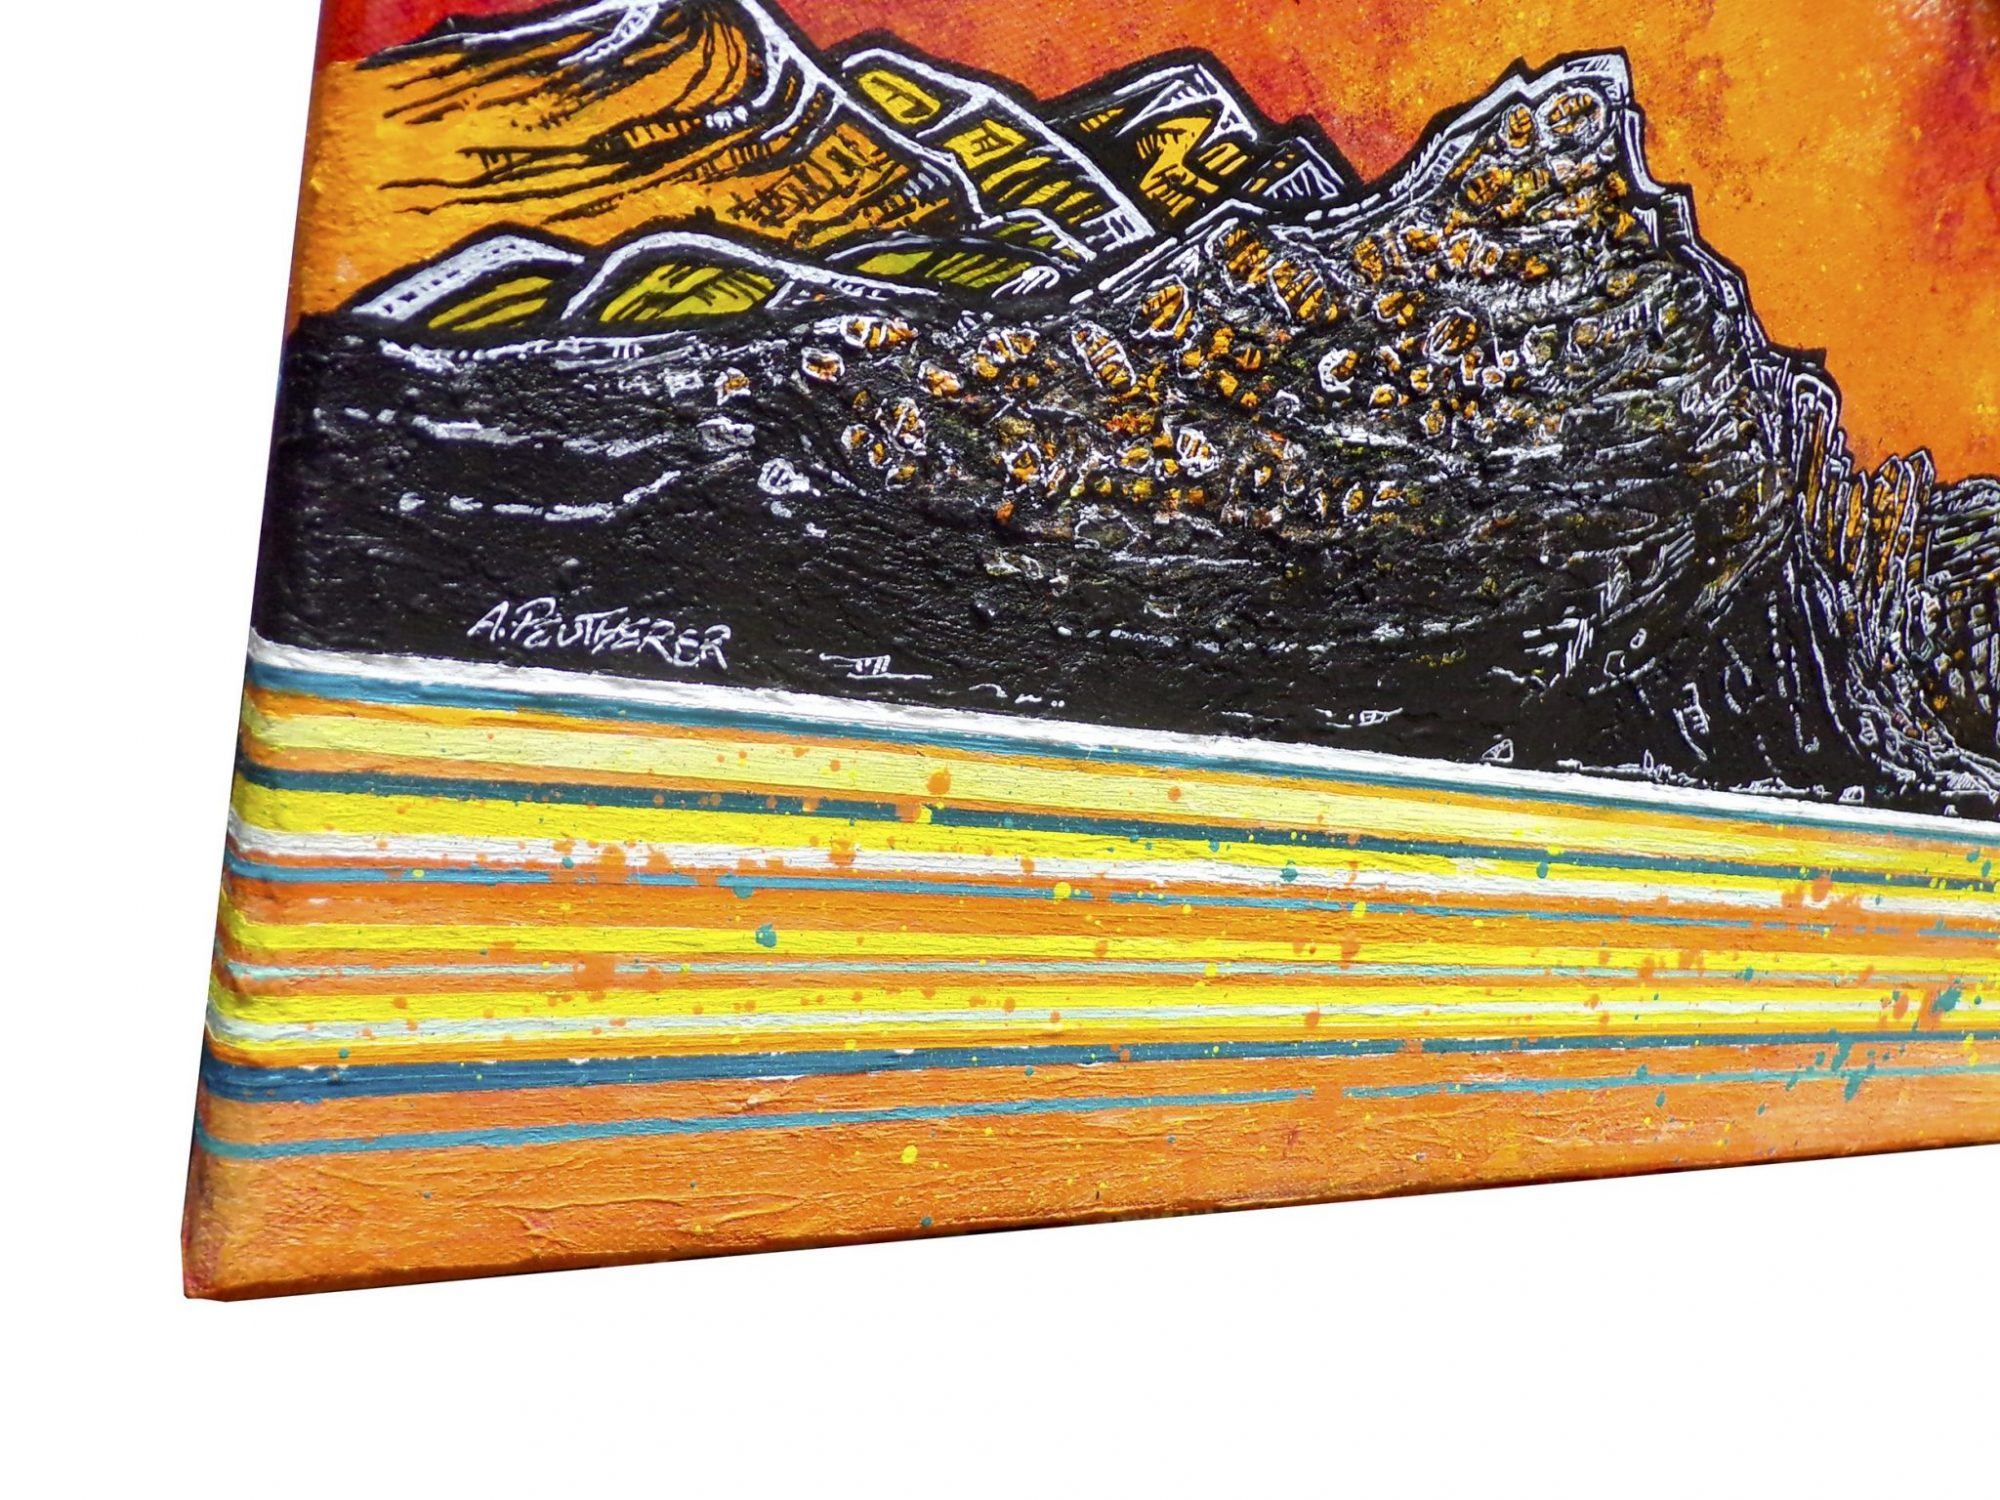 Trotternish Ridge, Near Sconser, Skye - Original painting and prints (detail shot)